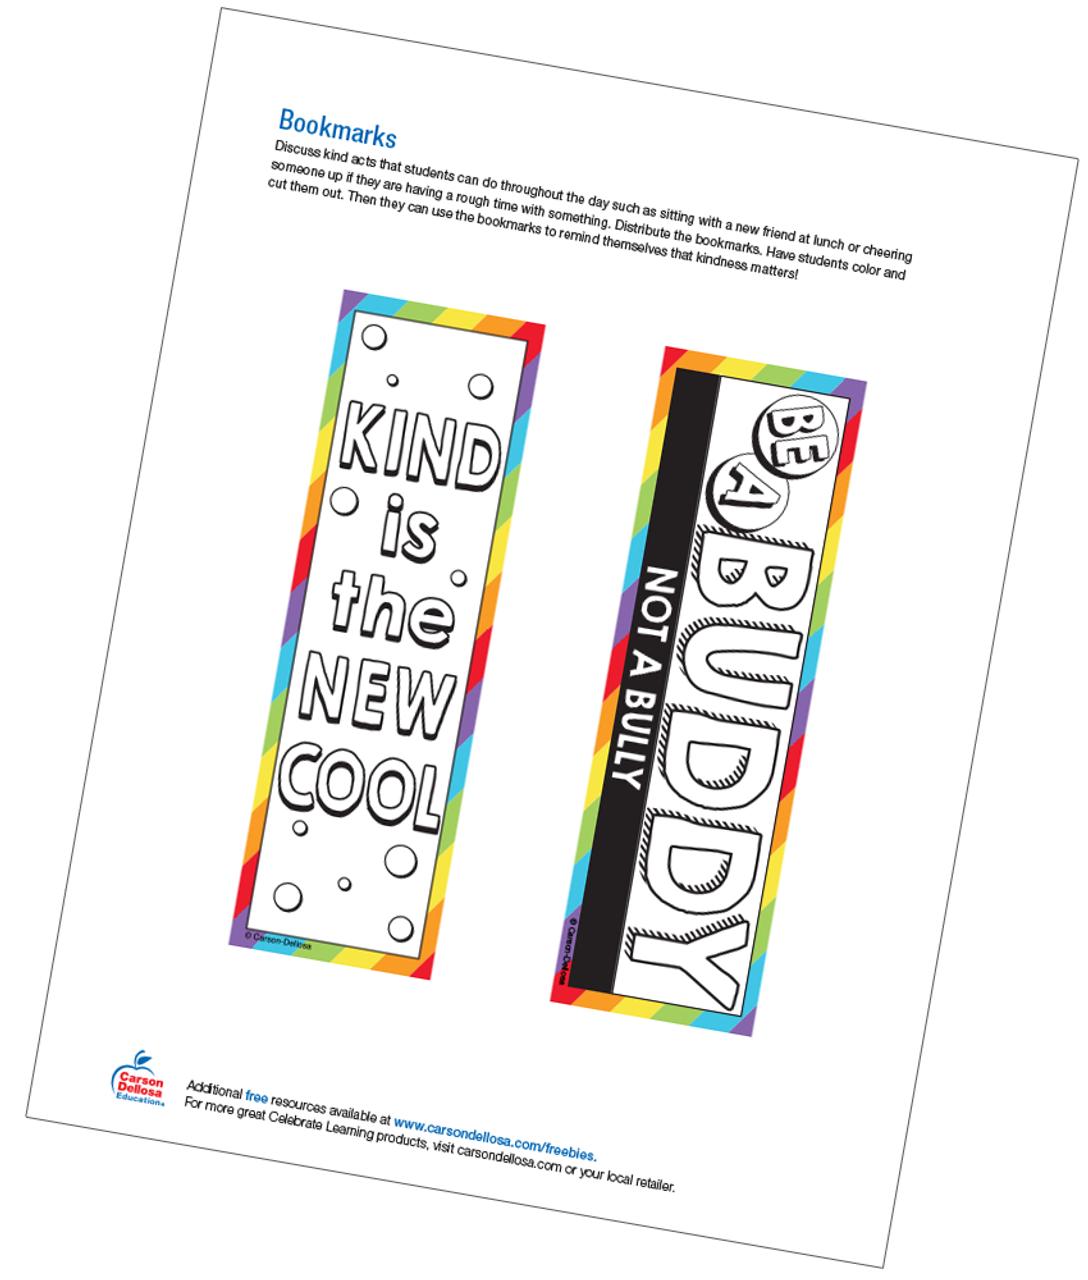 photo regarding Bookmarks Printable referred to as Bookmarks No cost Printable - Carson Dellosa Training